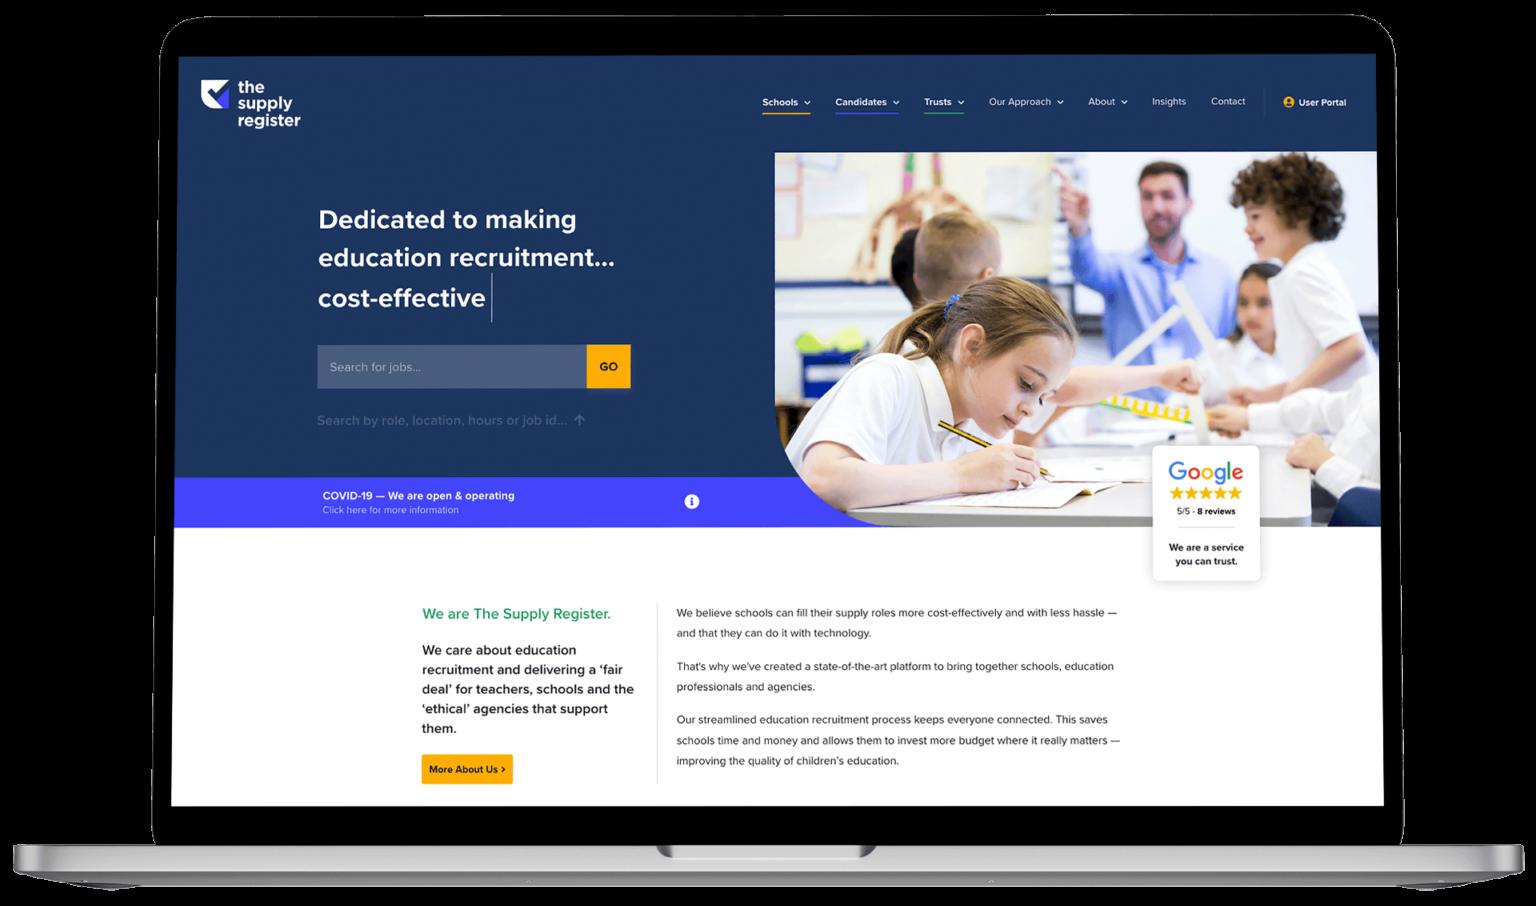 Website Design - The Supply Register